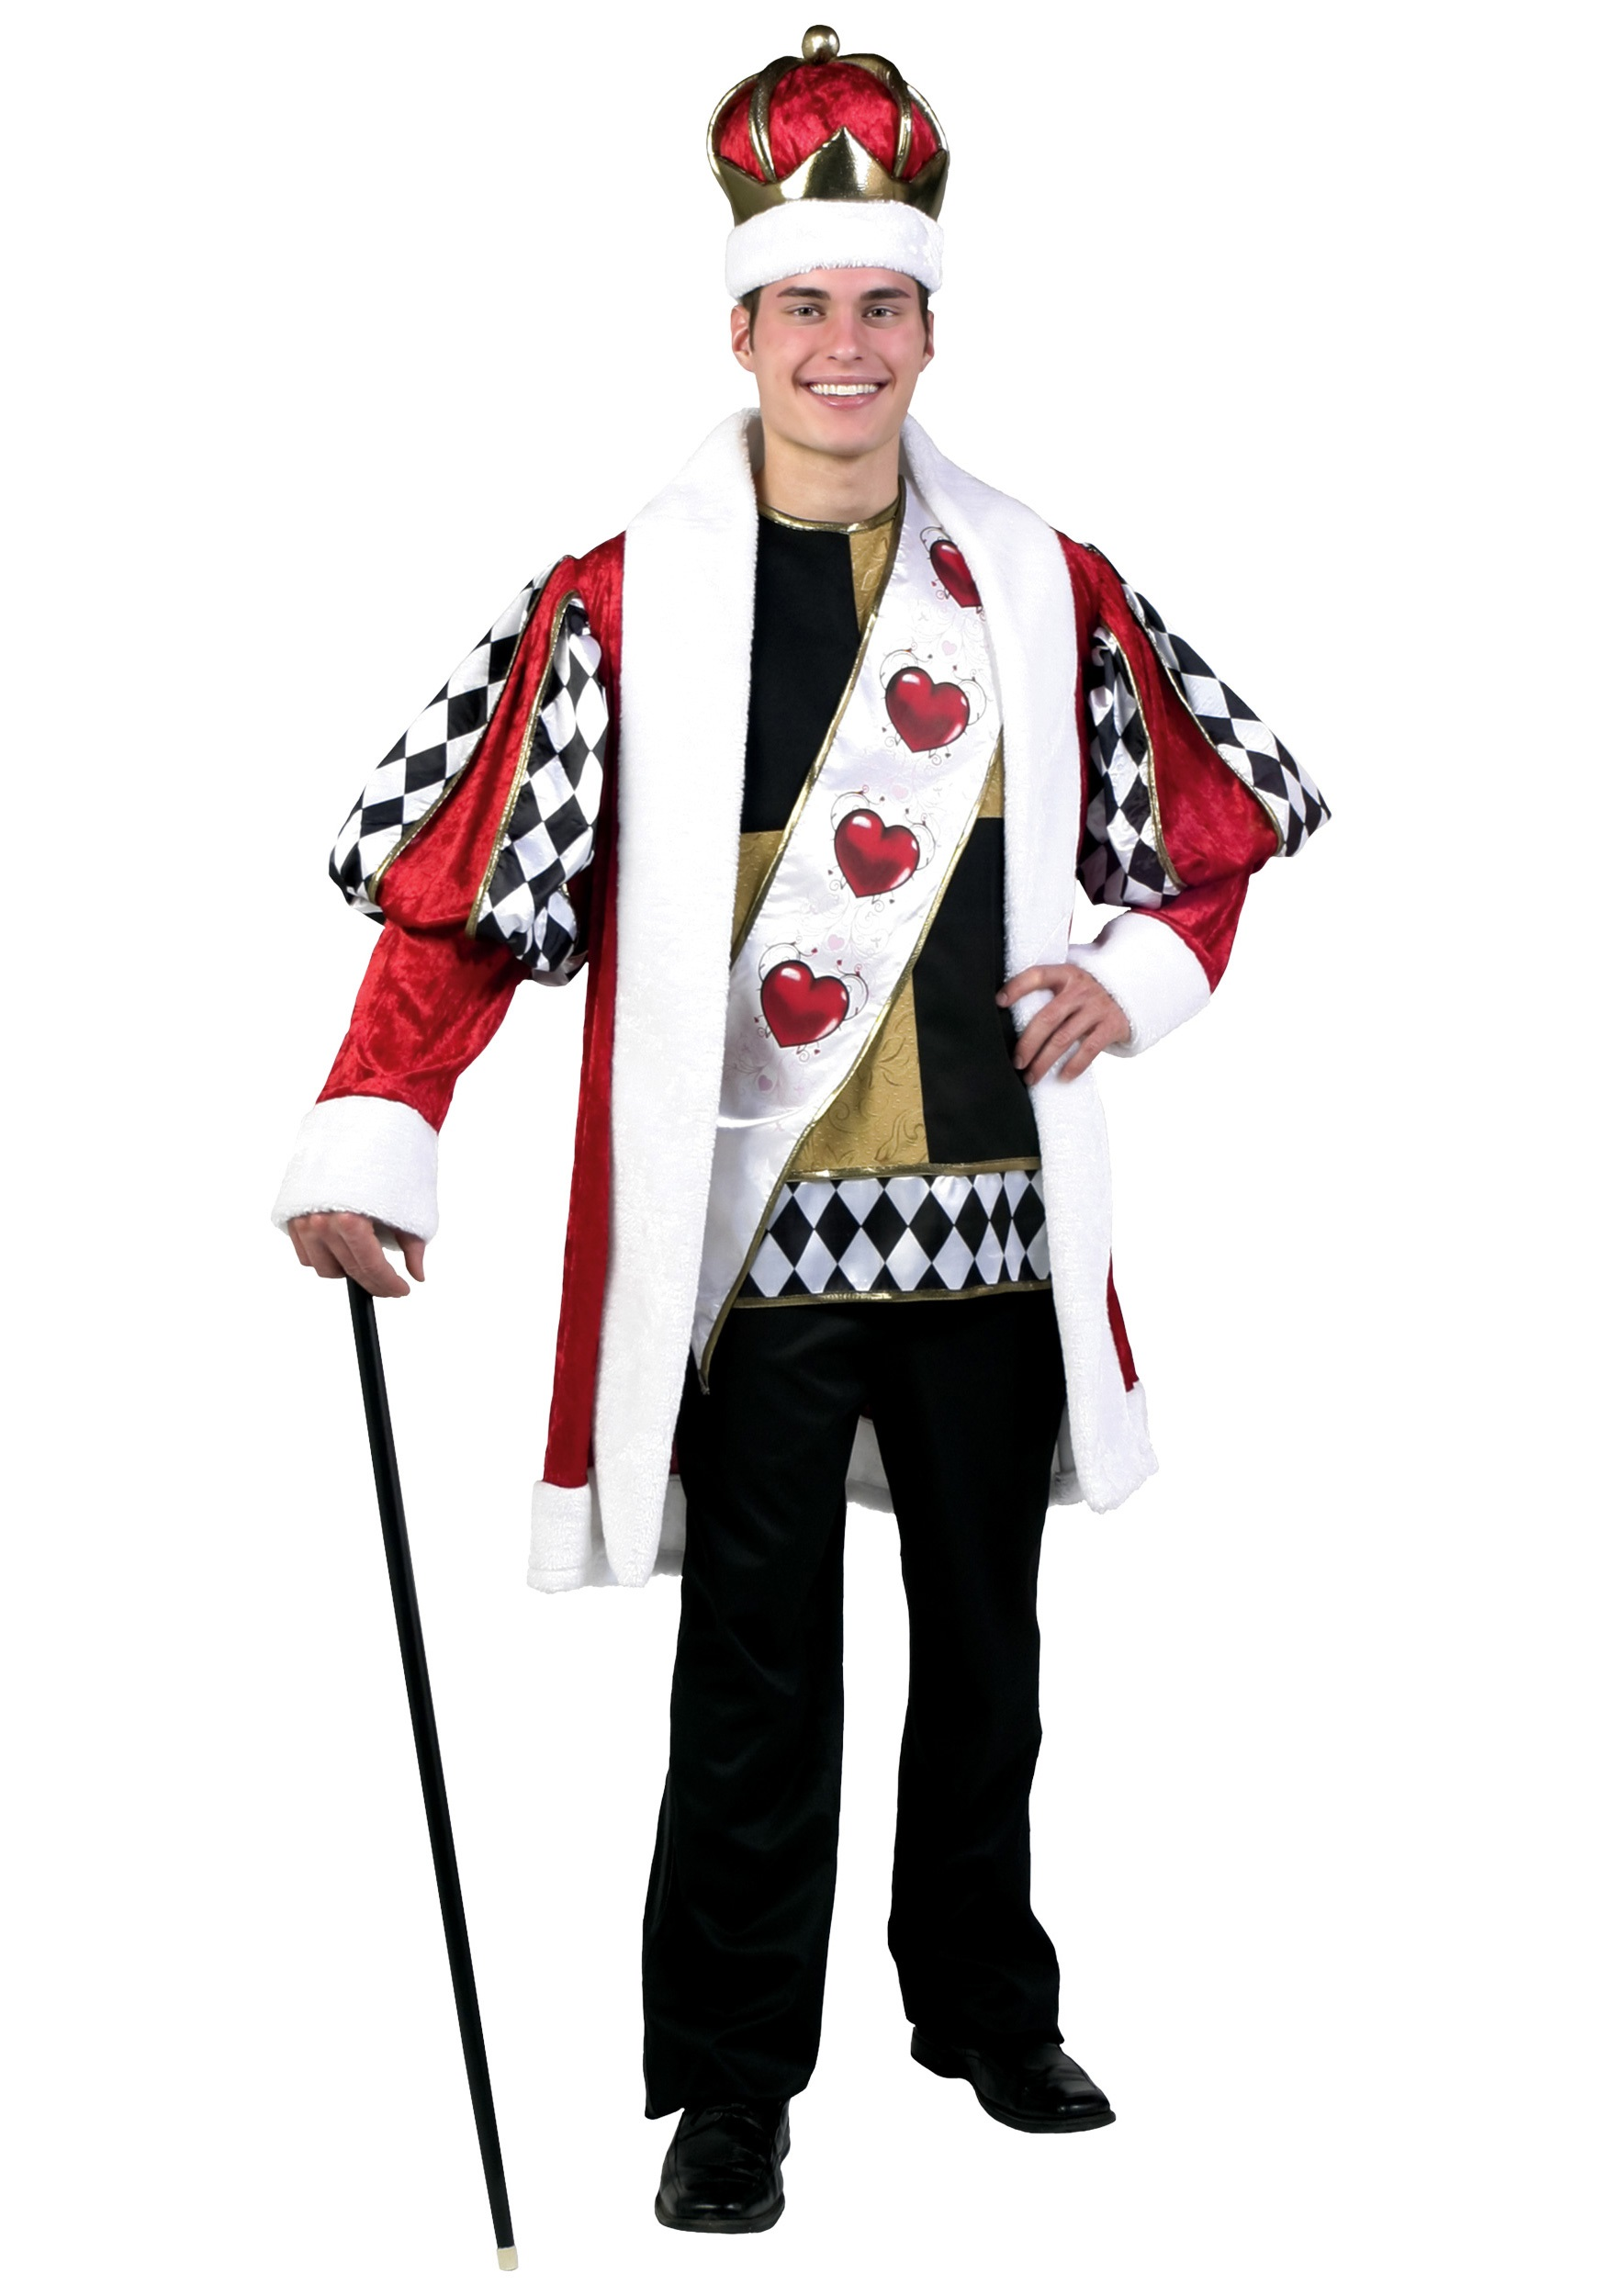 plus size elite queen of hearts costume king of hearts costumes adult halloween costume couples costume